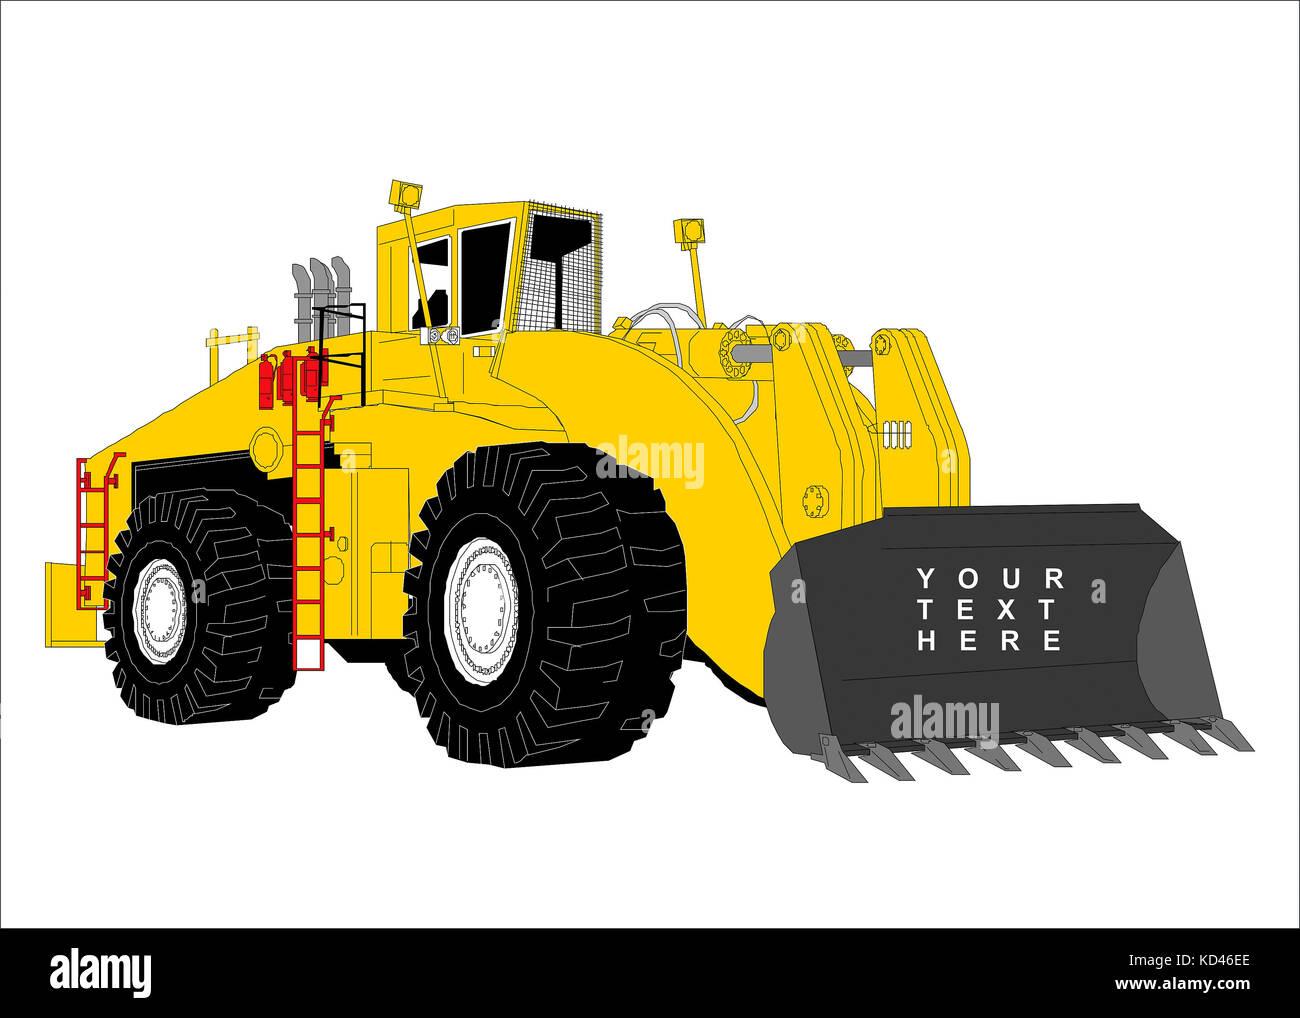 Drawn bulldozer on white background. Clip art, cartoon - Stock Image